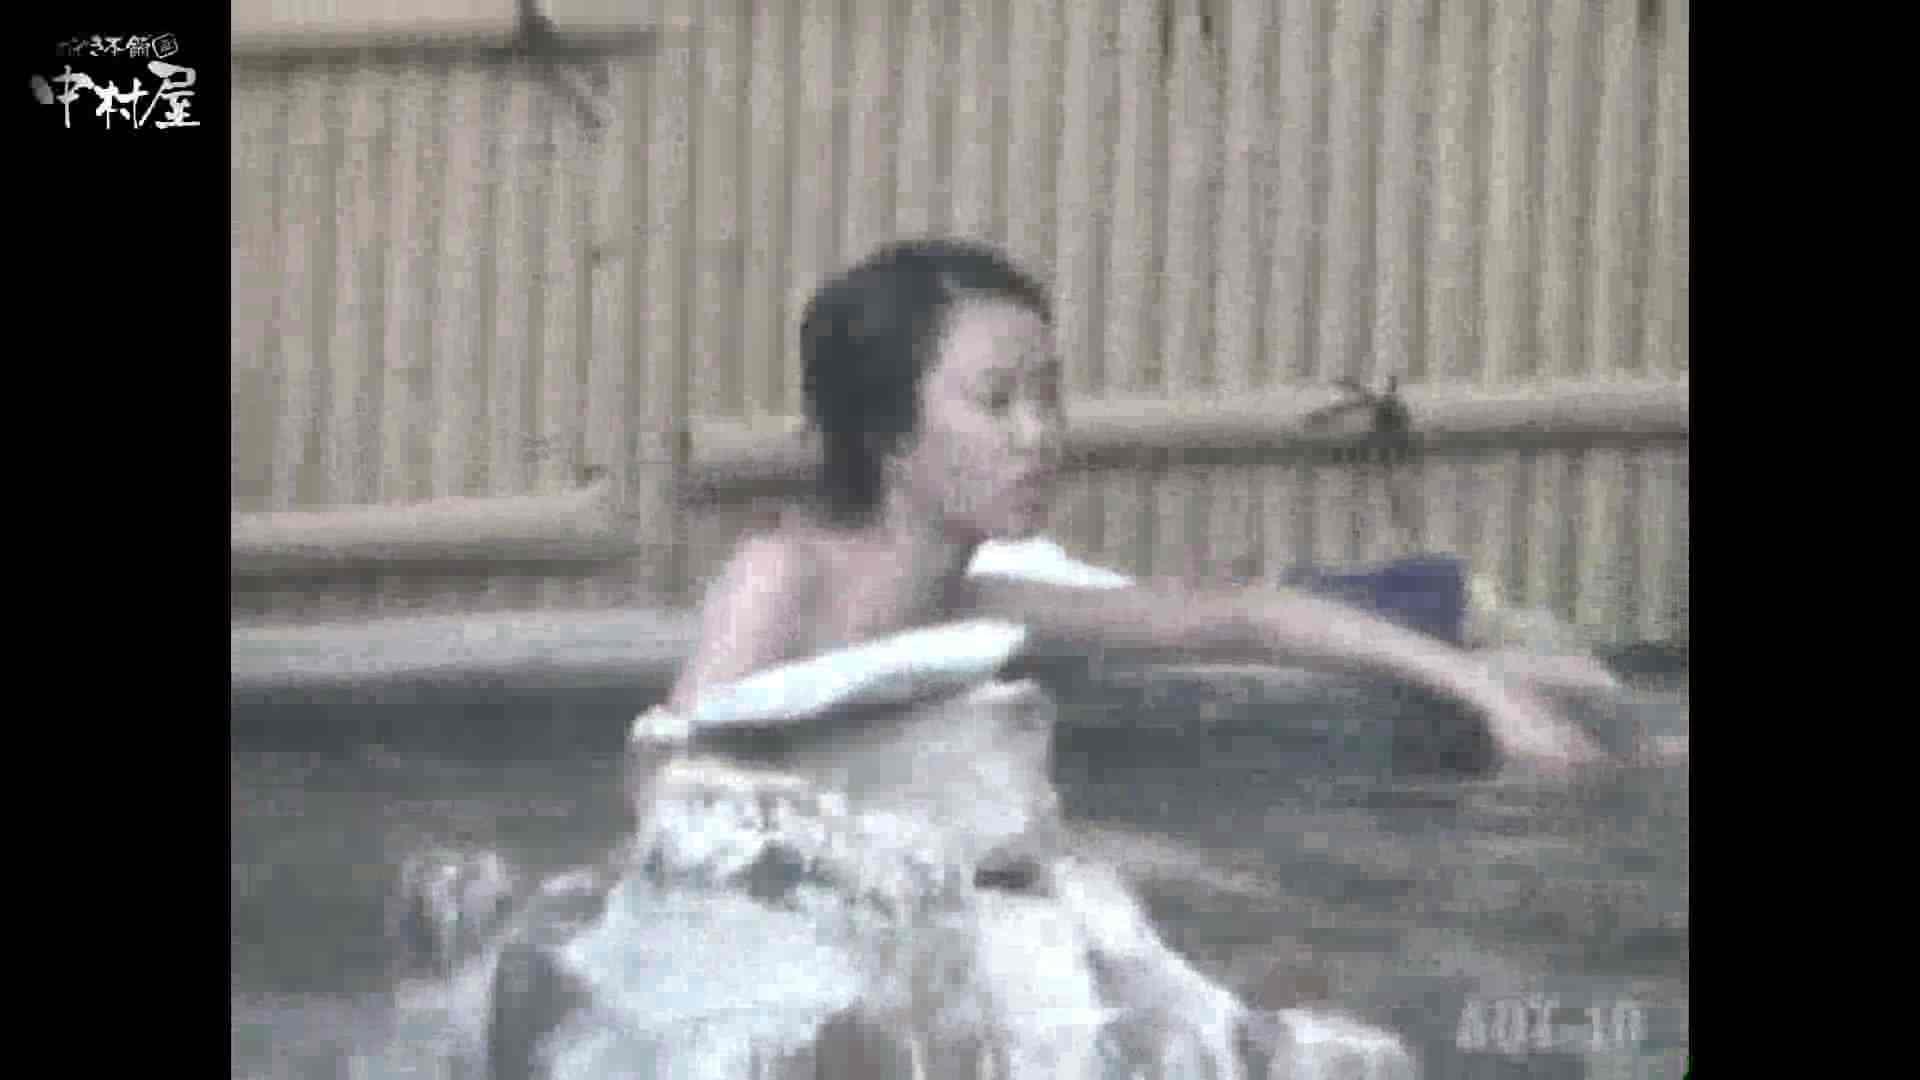 Aquaな露天風呂Vol.874潜入盗撮露天風呂十判湯 其の二 潜入突撃 オマンコ動画キャプチャ 90pic 67